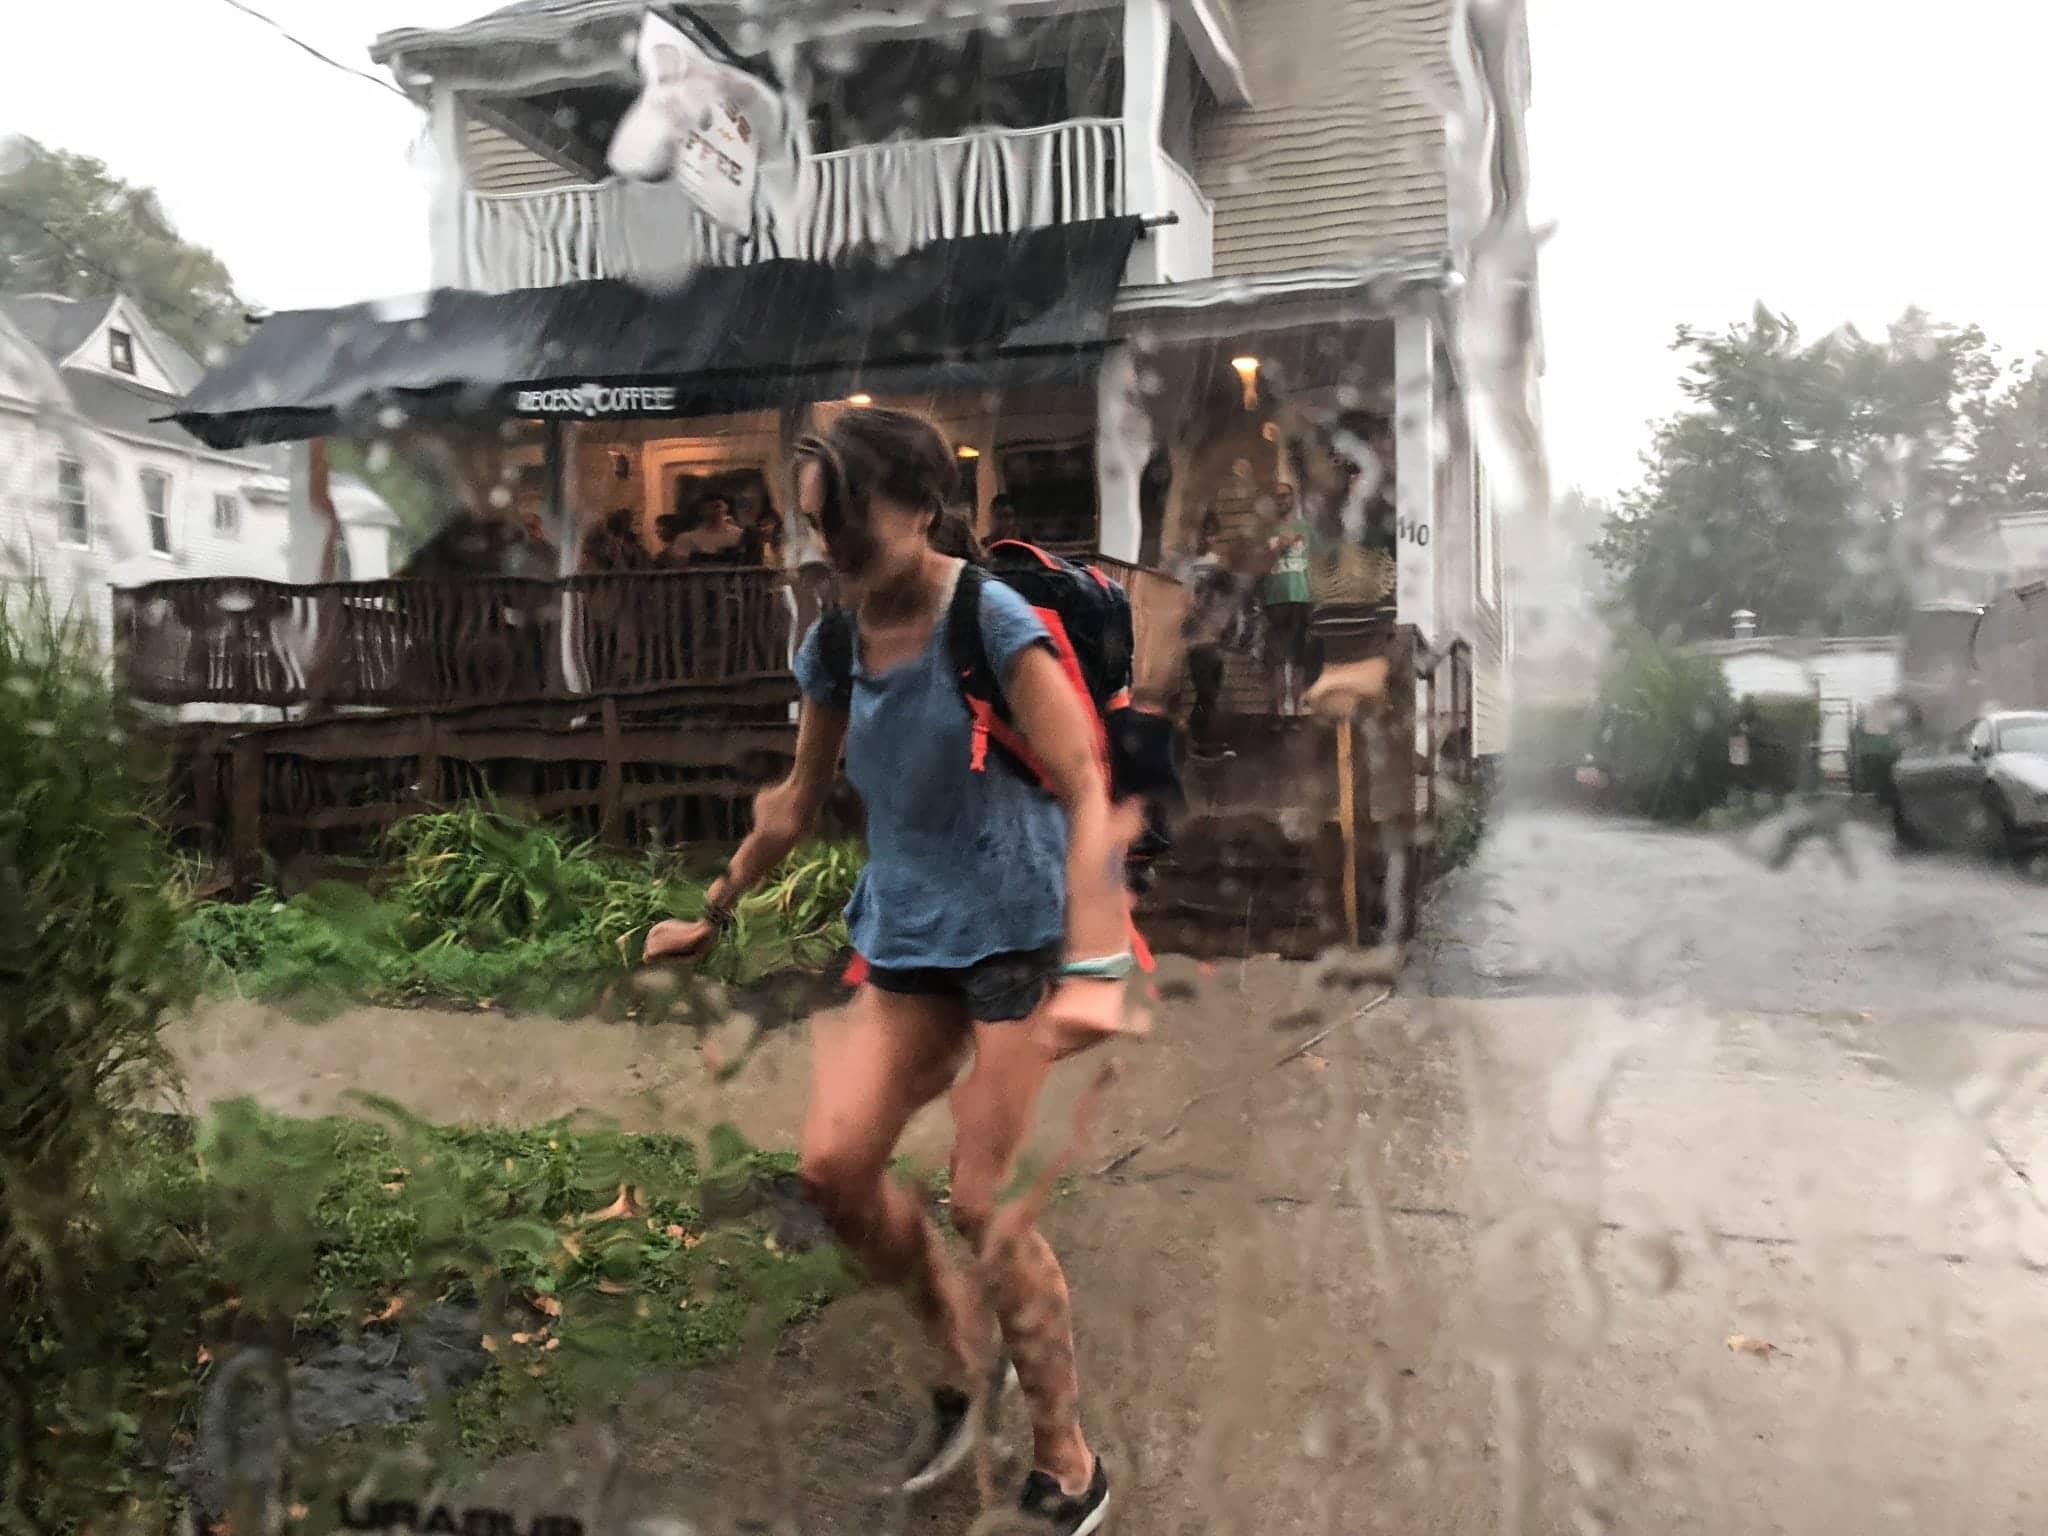 Dashing through the rain